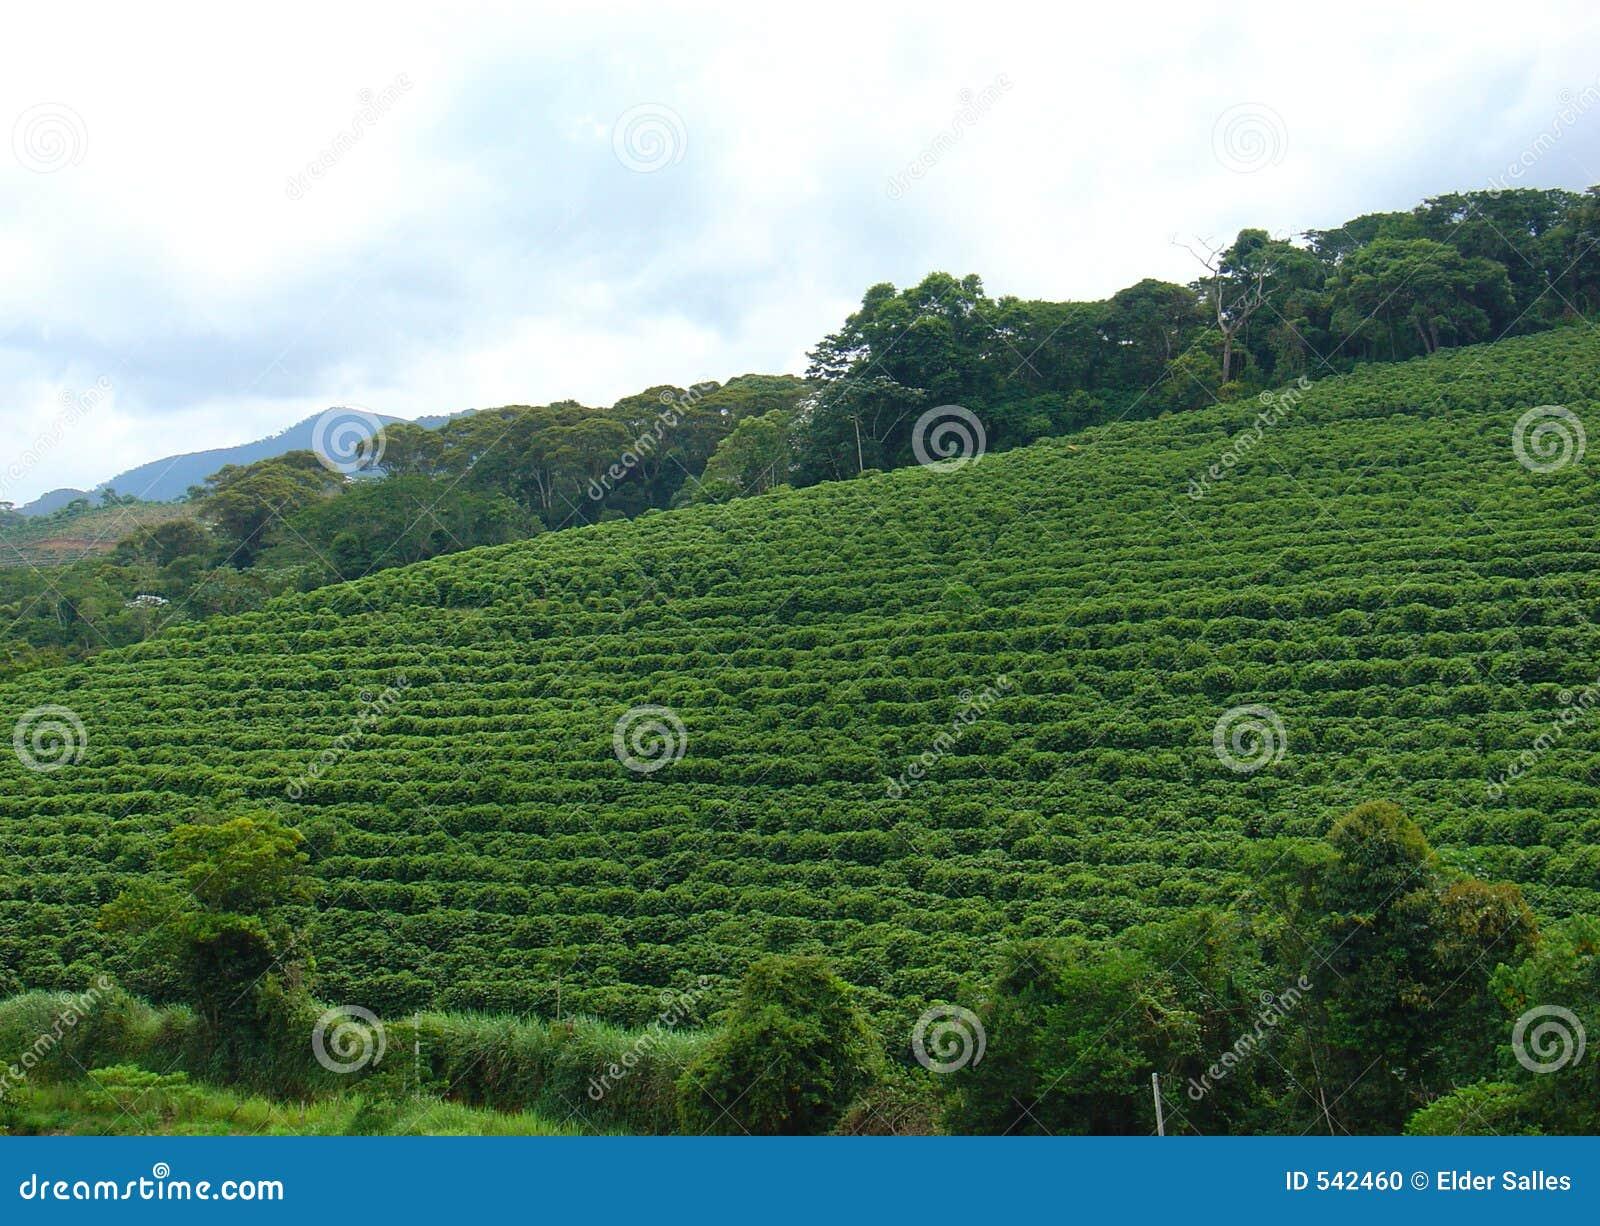 Download 咖啡种植园 库存照片. 图片 包括有 问题的, 云彩, 种田, 农田, 收获, 种植, 商品, 打赌的人, 前面 - 542460